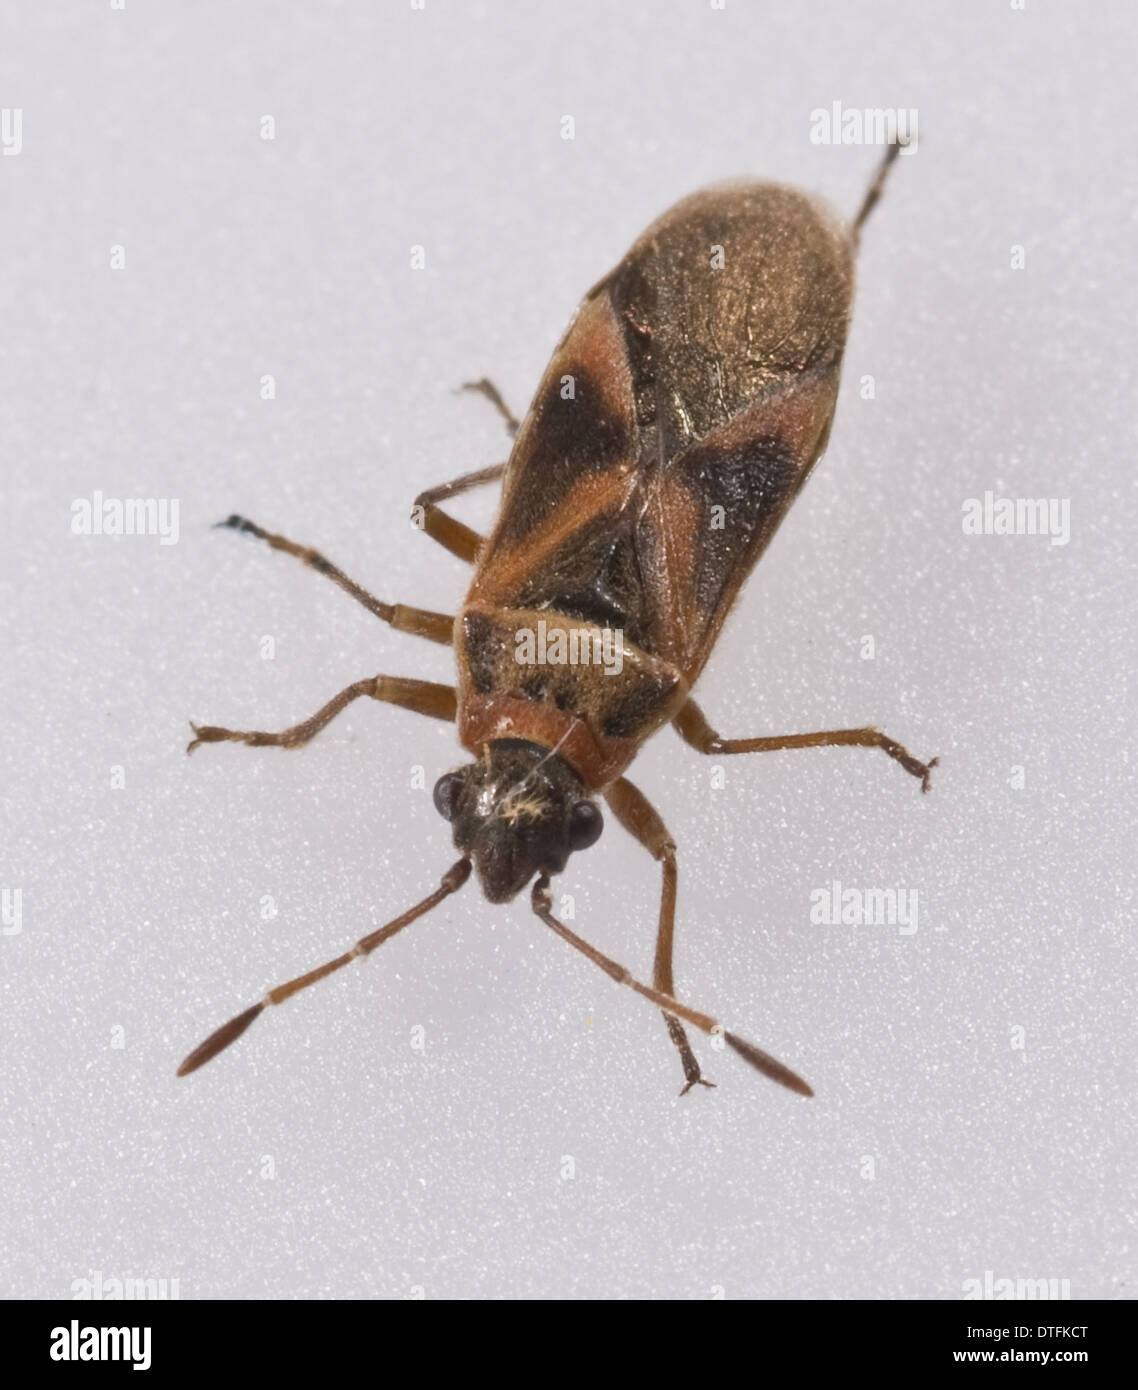 'Mystery bug' found in NHM Wildlife garden - Stock Image